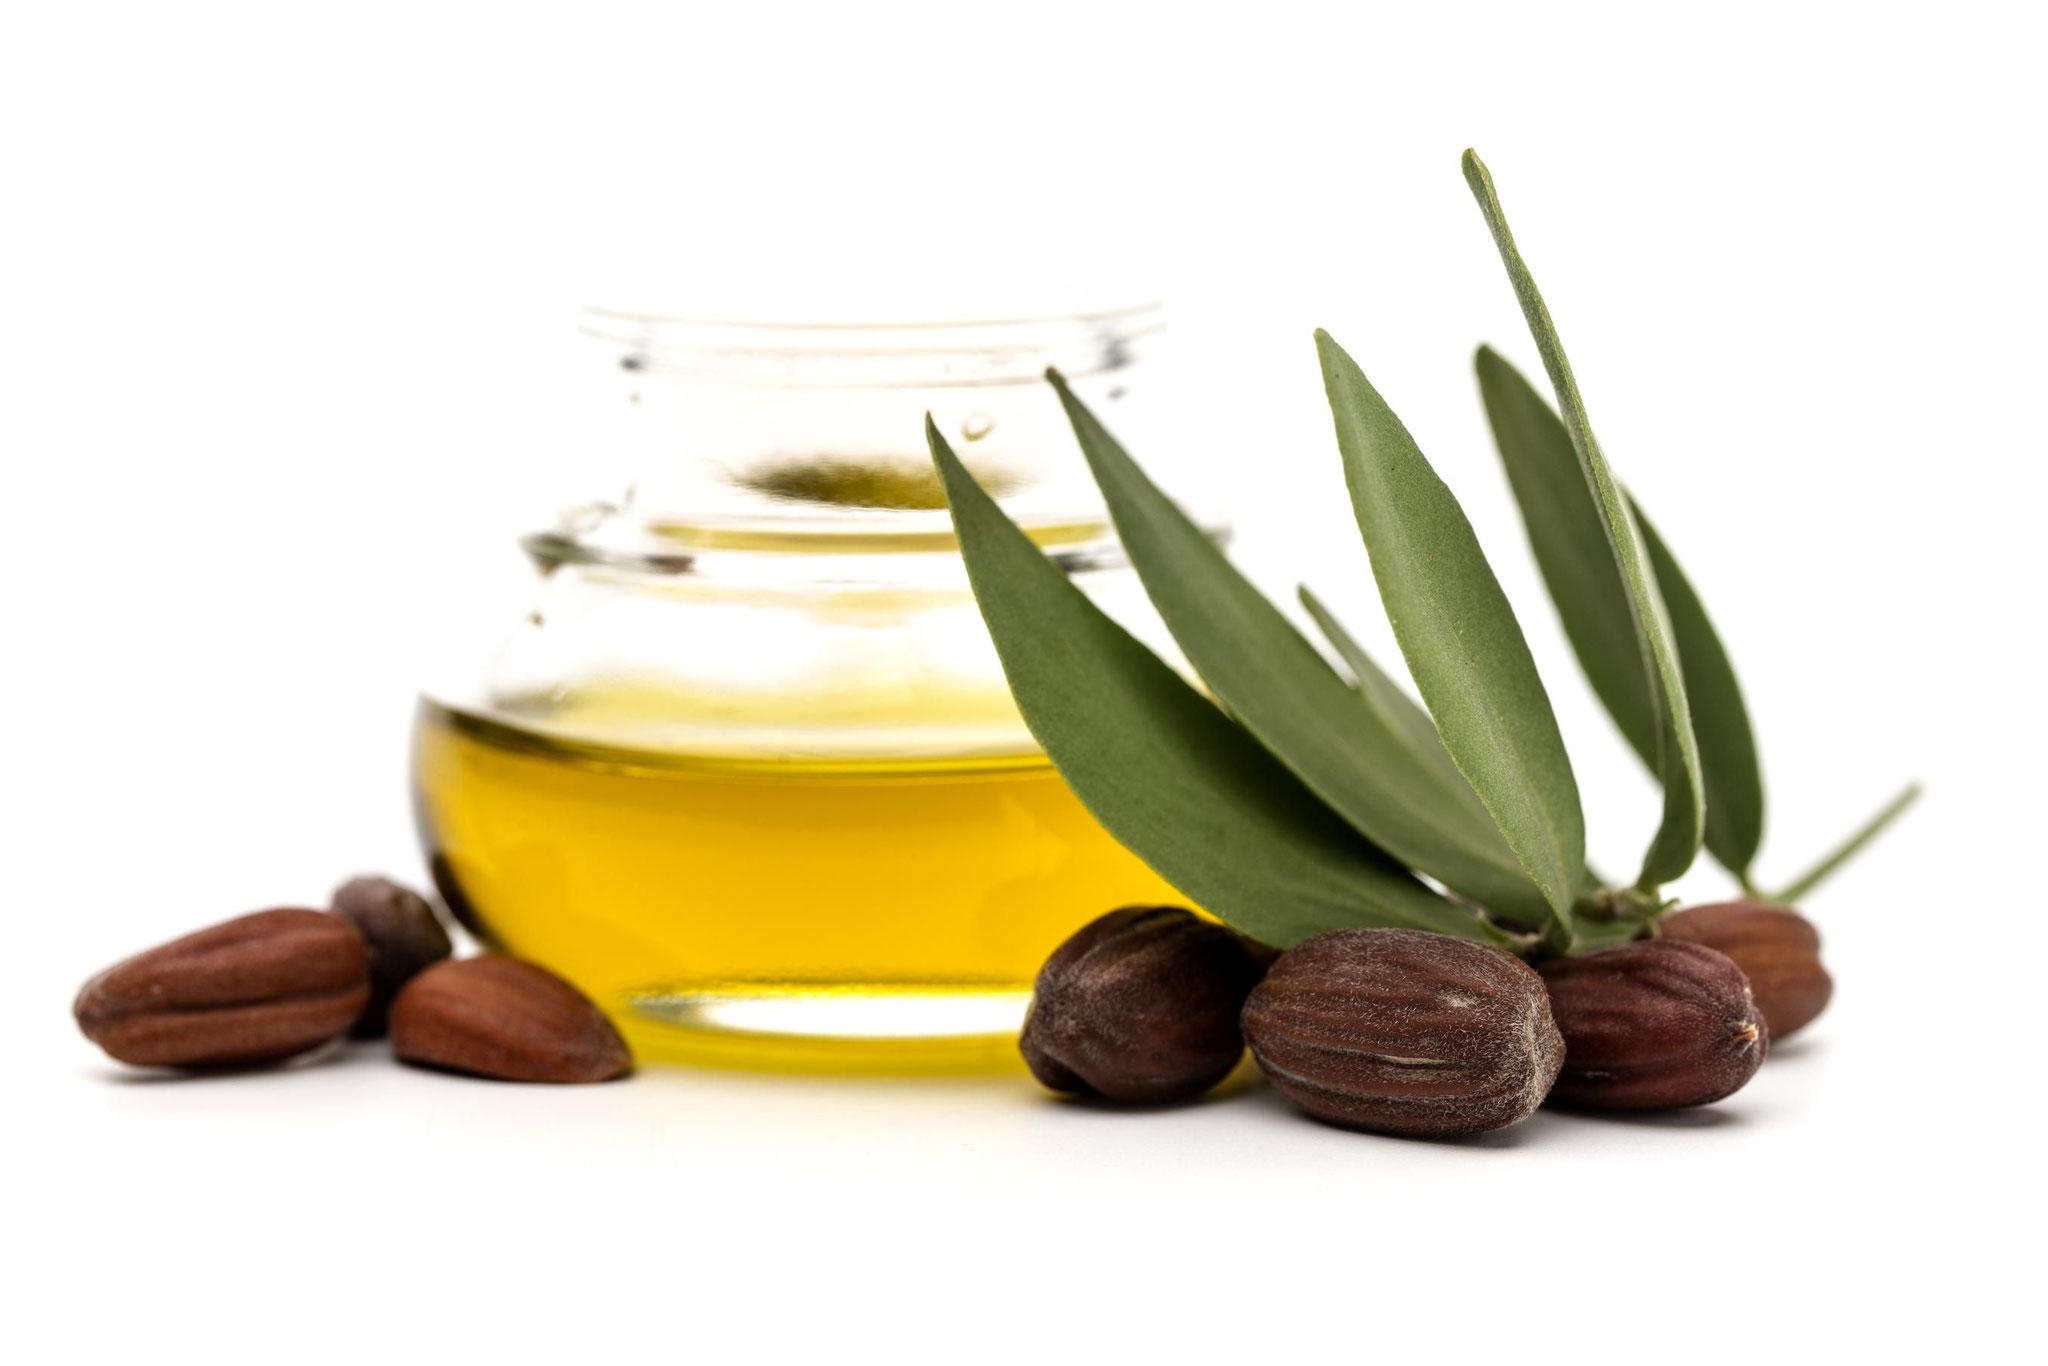 Verser 10 ml d'huile Végétale de Jojoba (ou Amande Douce)